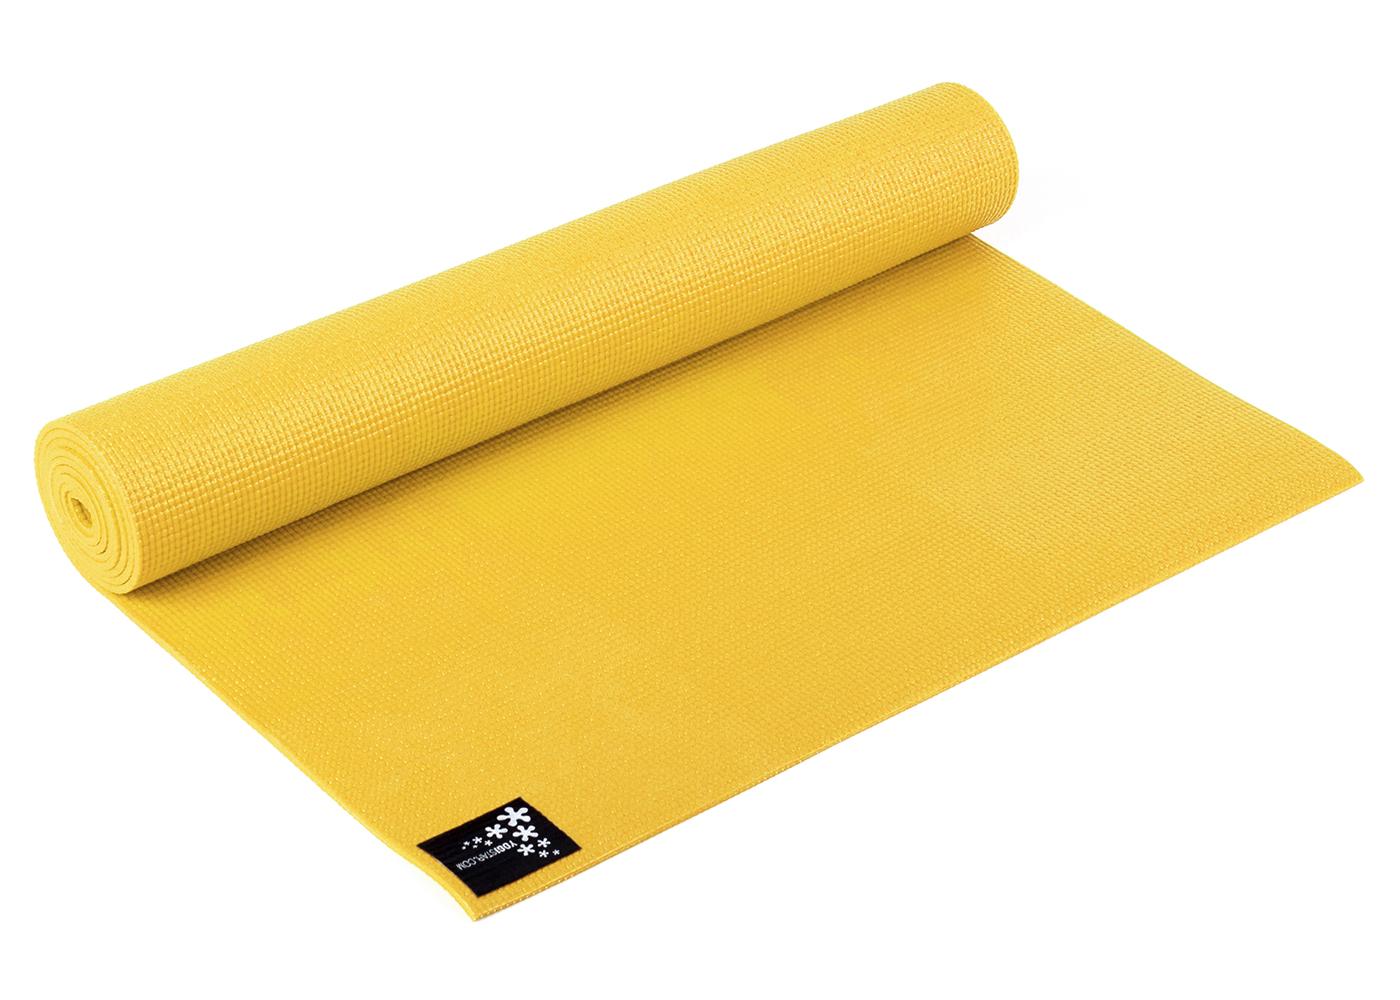 Yoga Mat For Children Buy Online At Yogistar Com Yoga